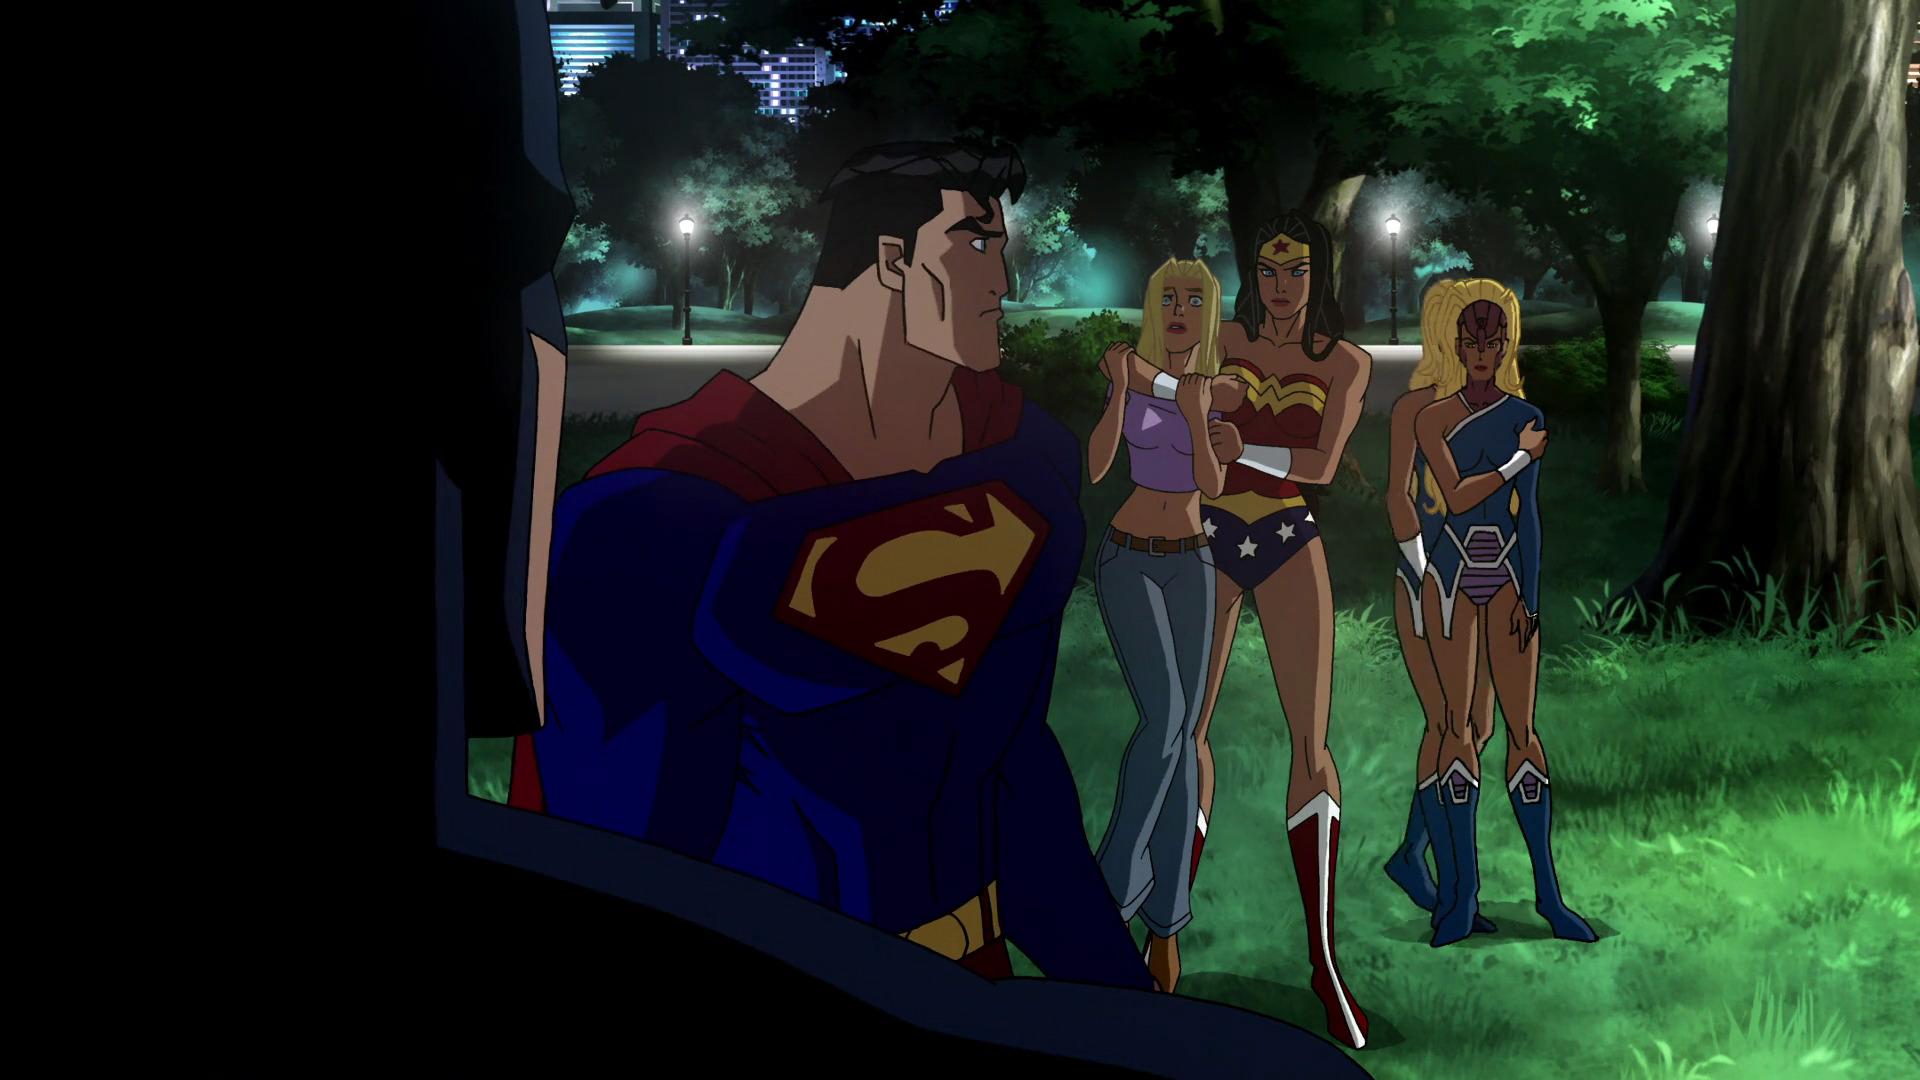 http://images6.fanpop.com/image/photos/37200000/Superman-Batman-Apocalypse-superman-and-wonder-woman-37259387-1920-1080.jpg